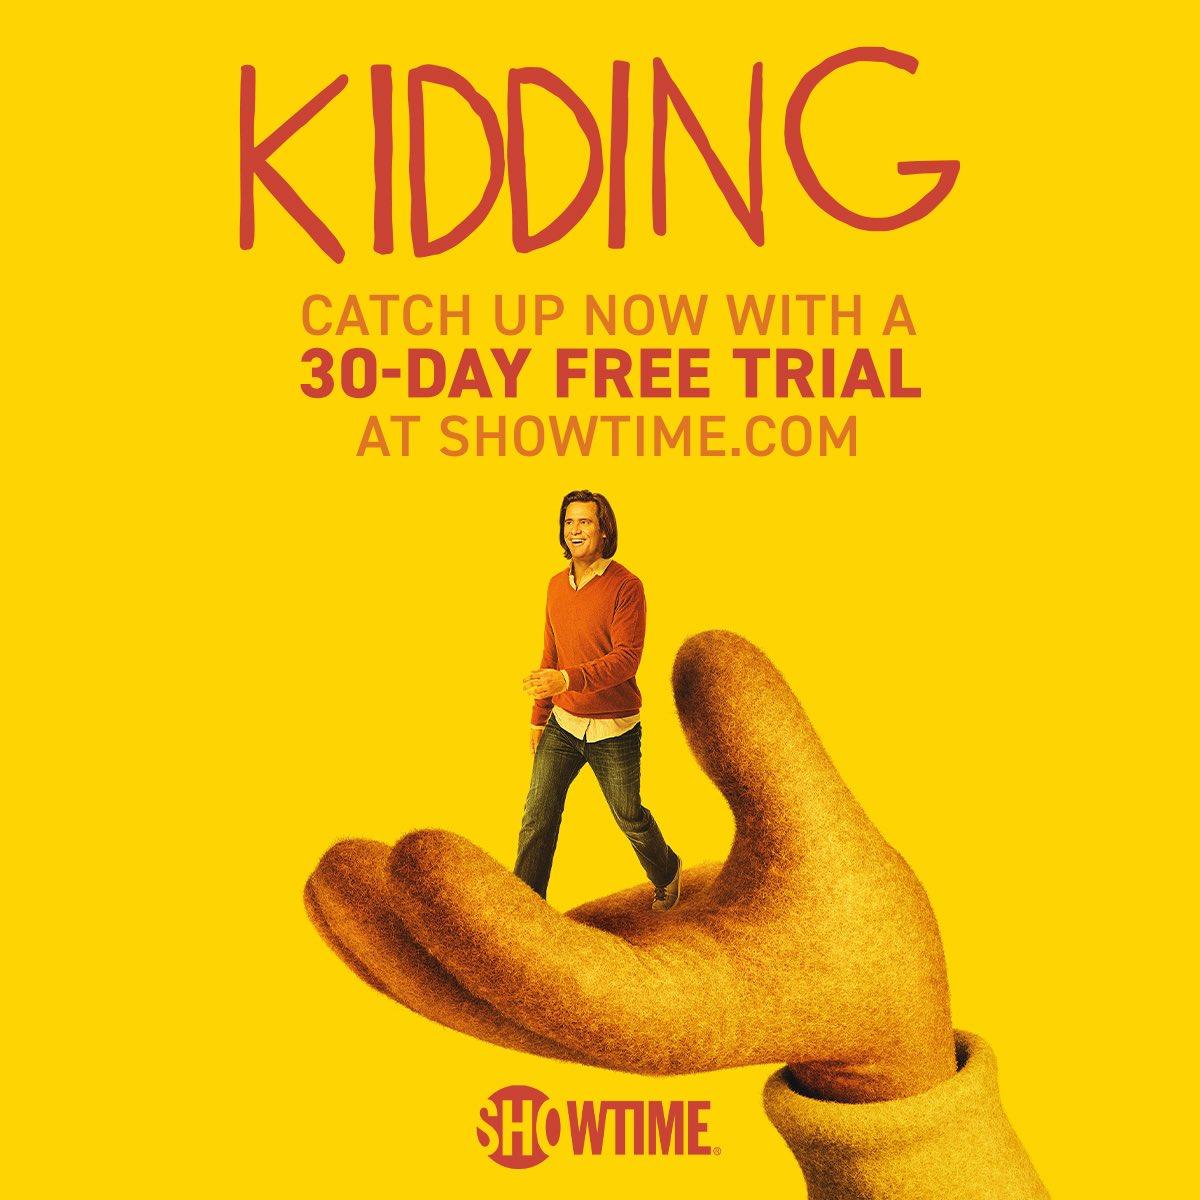 Free Showtime for your quarantine binging! Watch #Kidding Stay safe! @SHOKidding